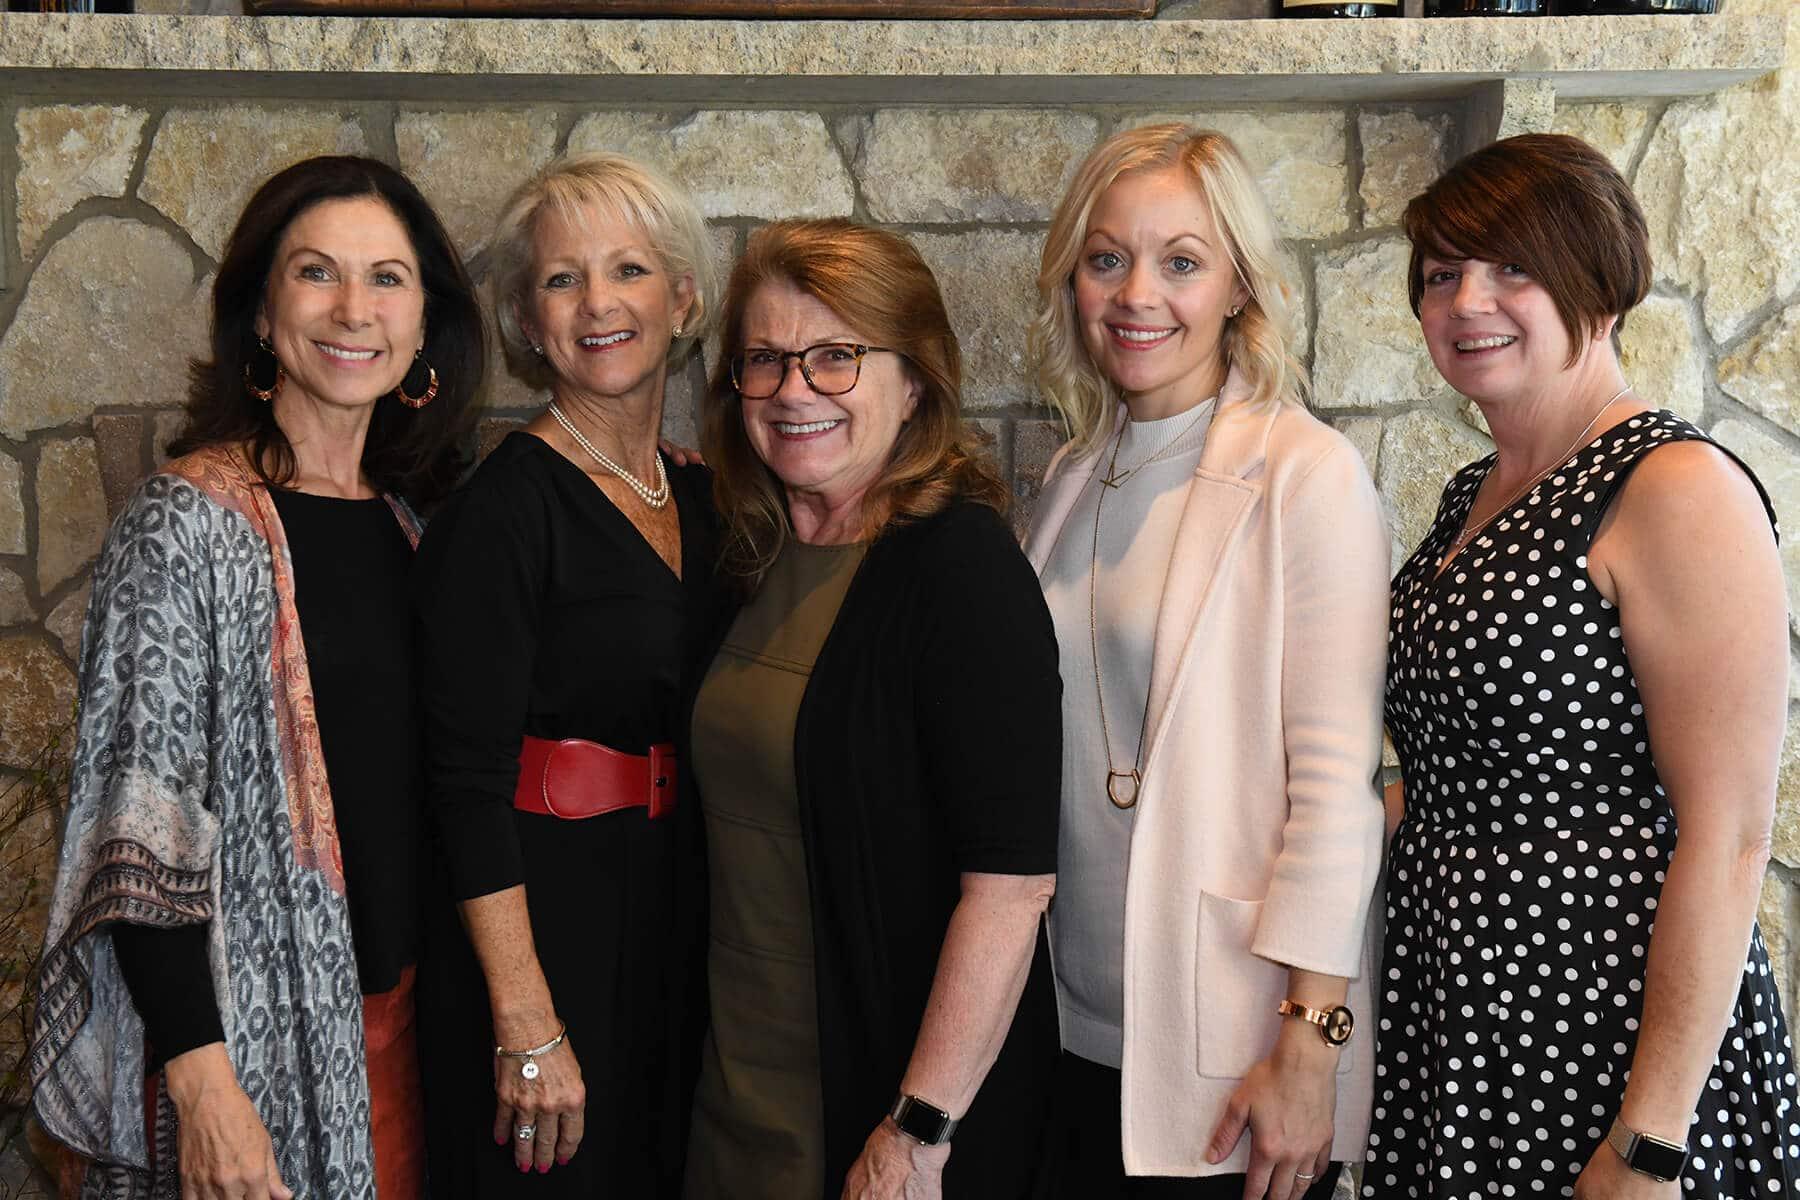 The 2019 Alliance Committee pictured above L to R: Mrs. Ellyn Hutton, Ms. Michelle Schneider, Mrs. Carmen Hupp, Mrs. Kristen Reddinger and Mrs. Angela Henderson